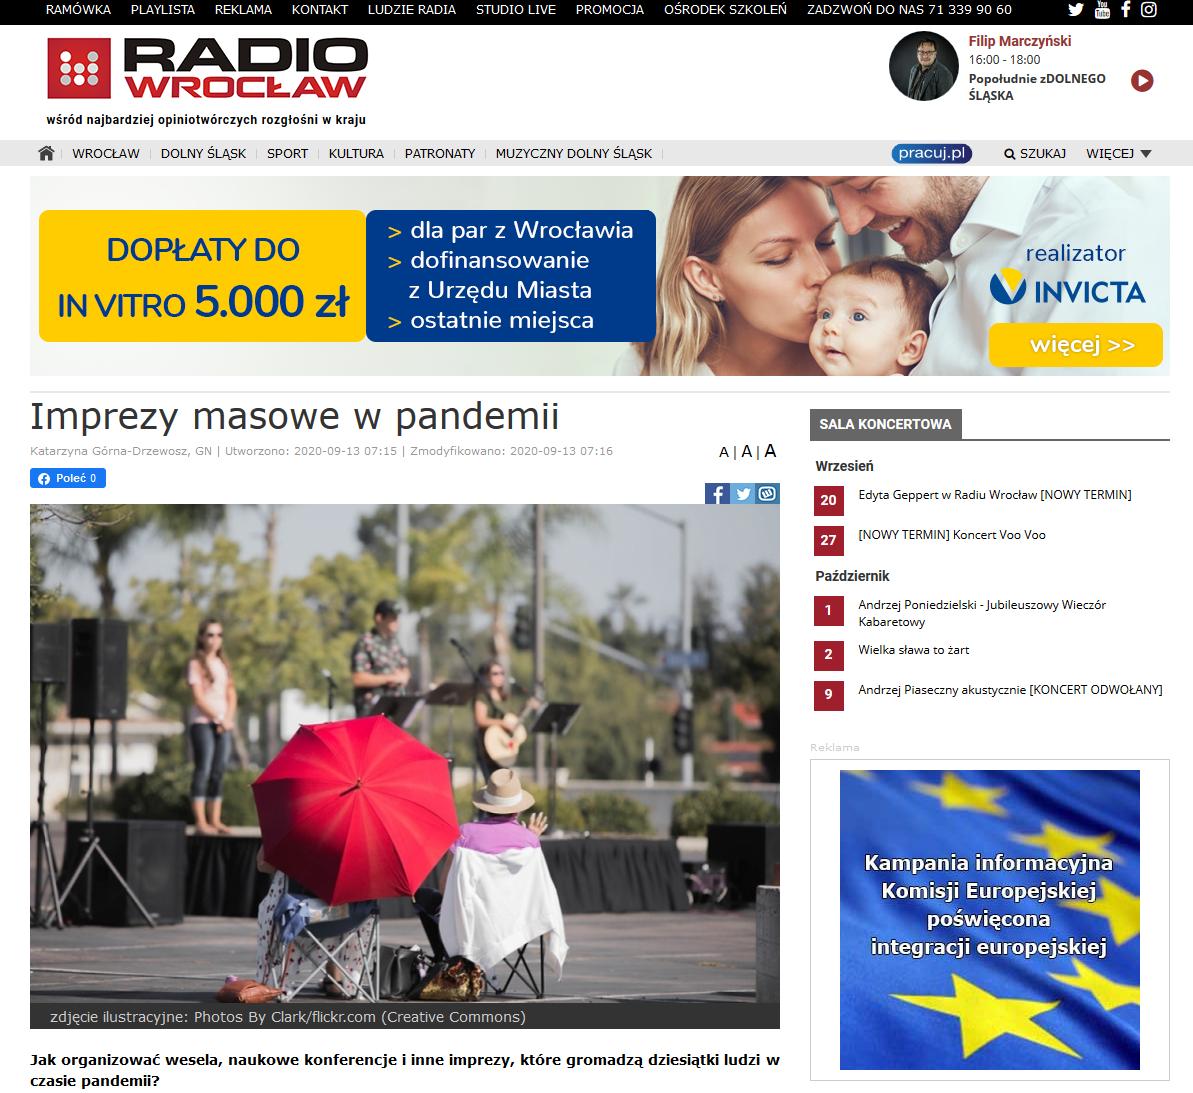 Screenshot 2020 09 14 Imprezy masowe wpandemii